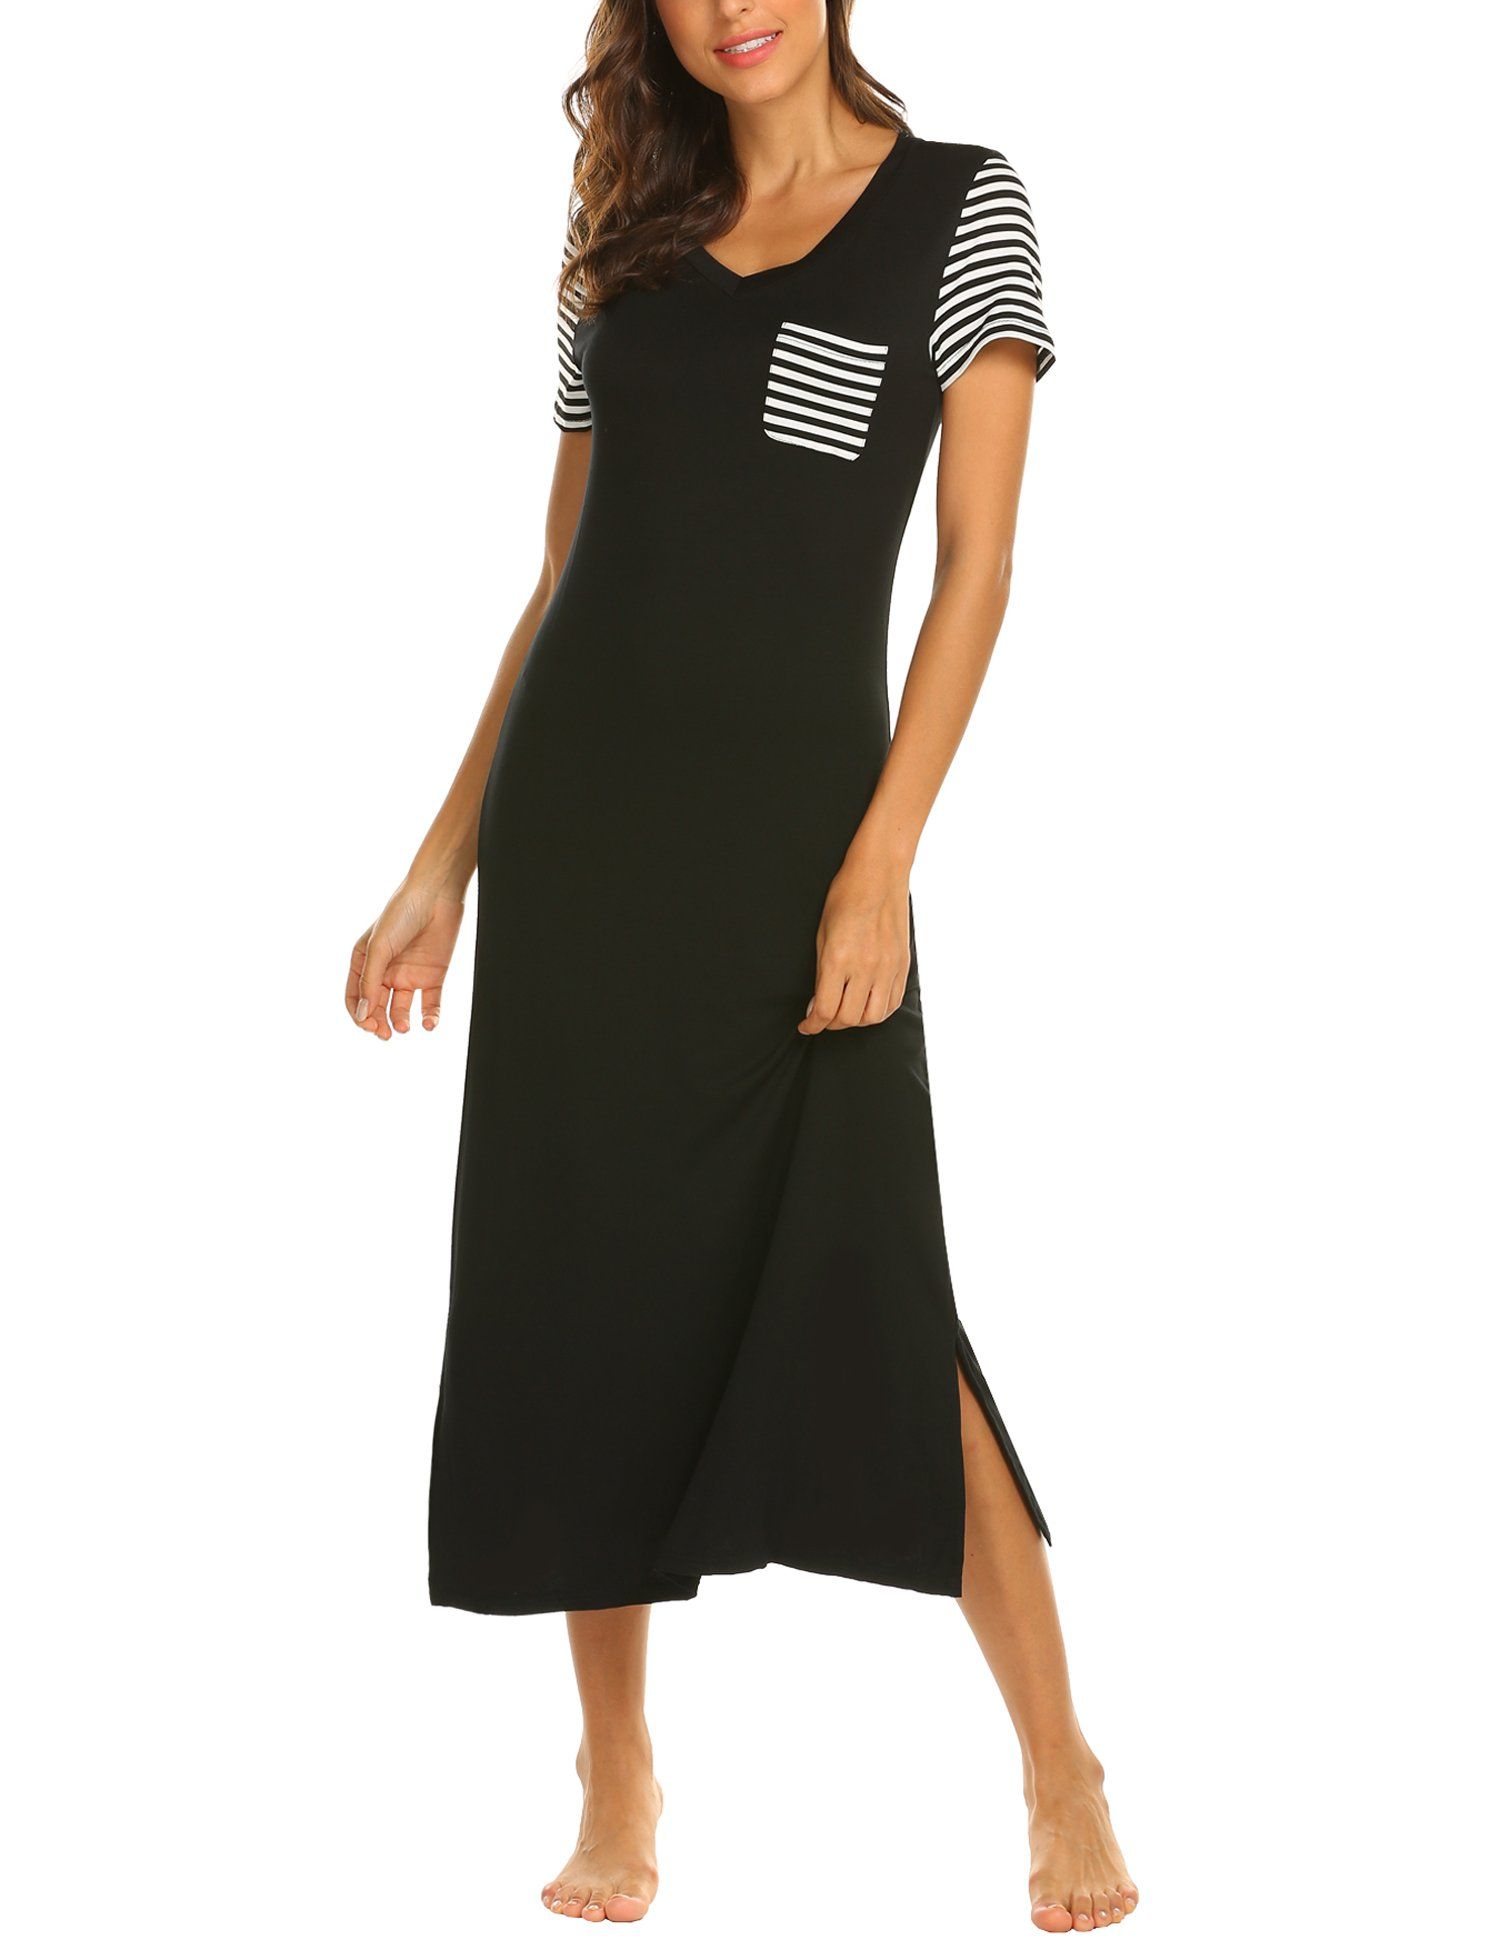 Hotouch Soft Nightgown/Women Sleepwear Dress/Striped Sleep Dress Black Large